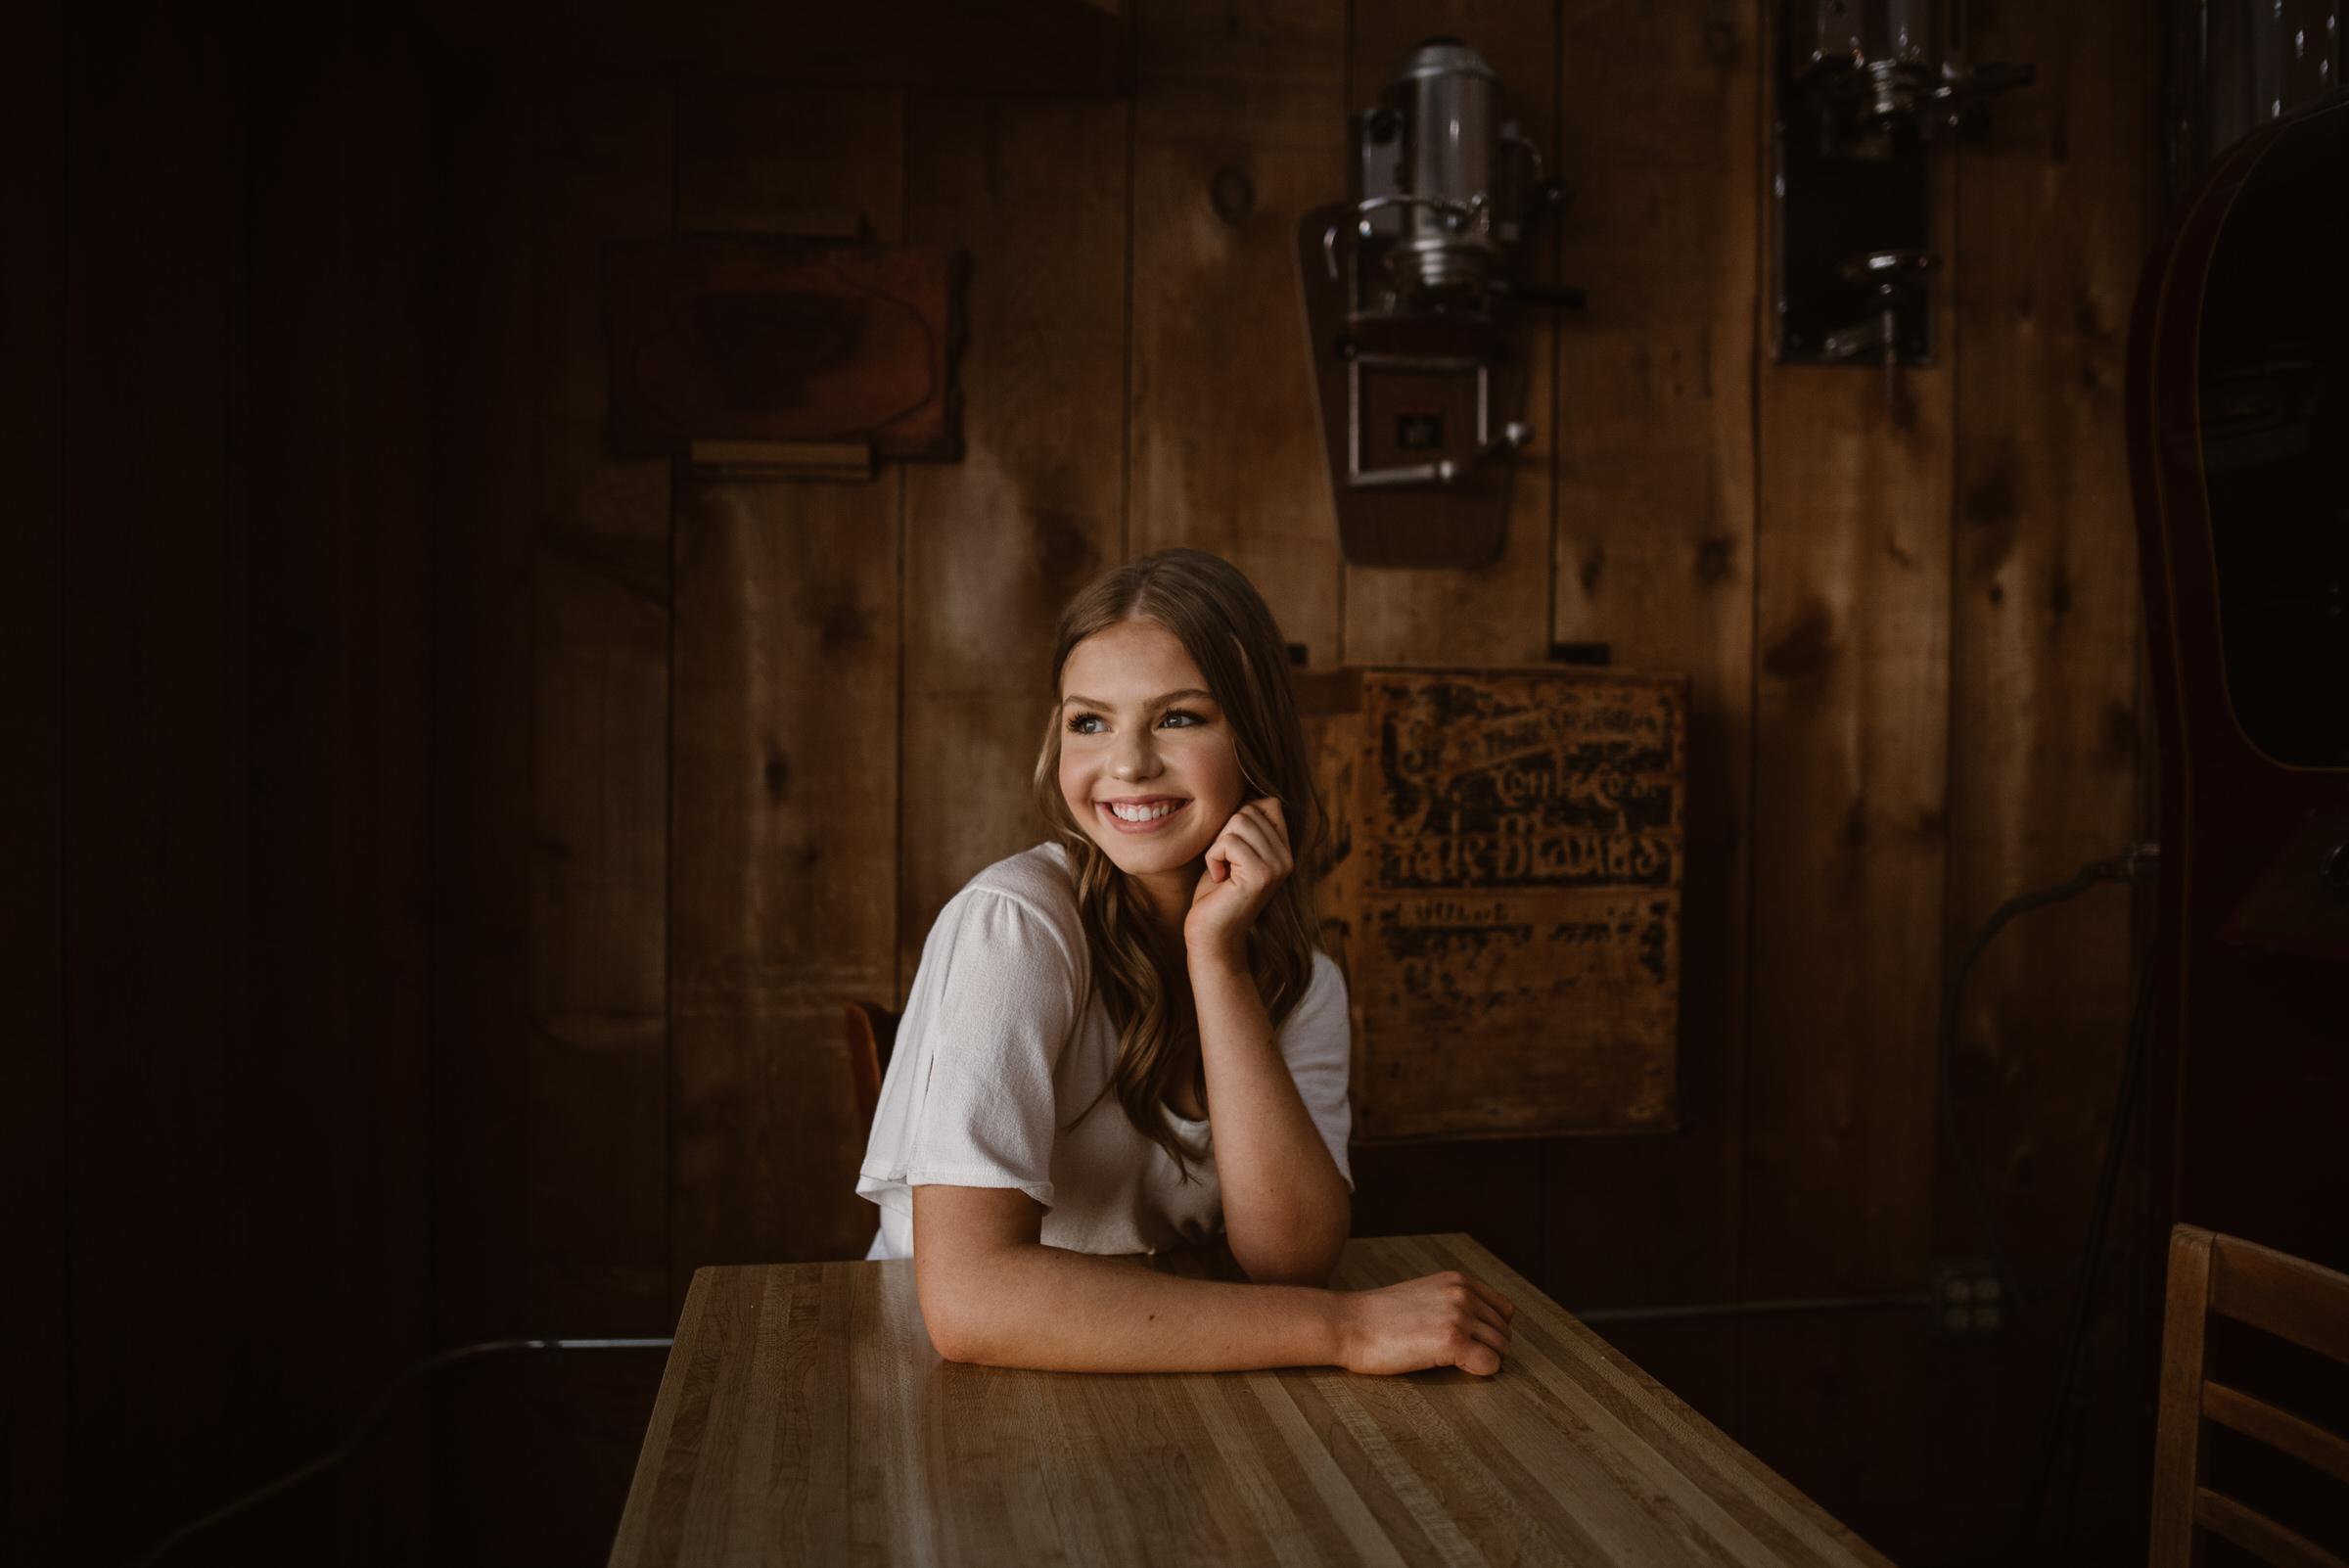 Kaylie-Sirek-Photography-Lincoln-Nebraska-Senior-021.jpg